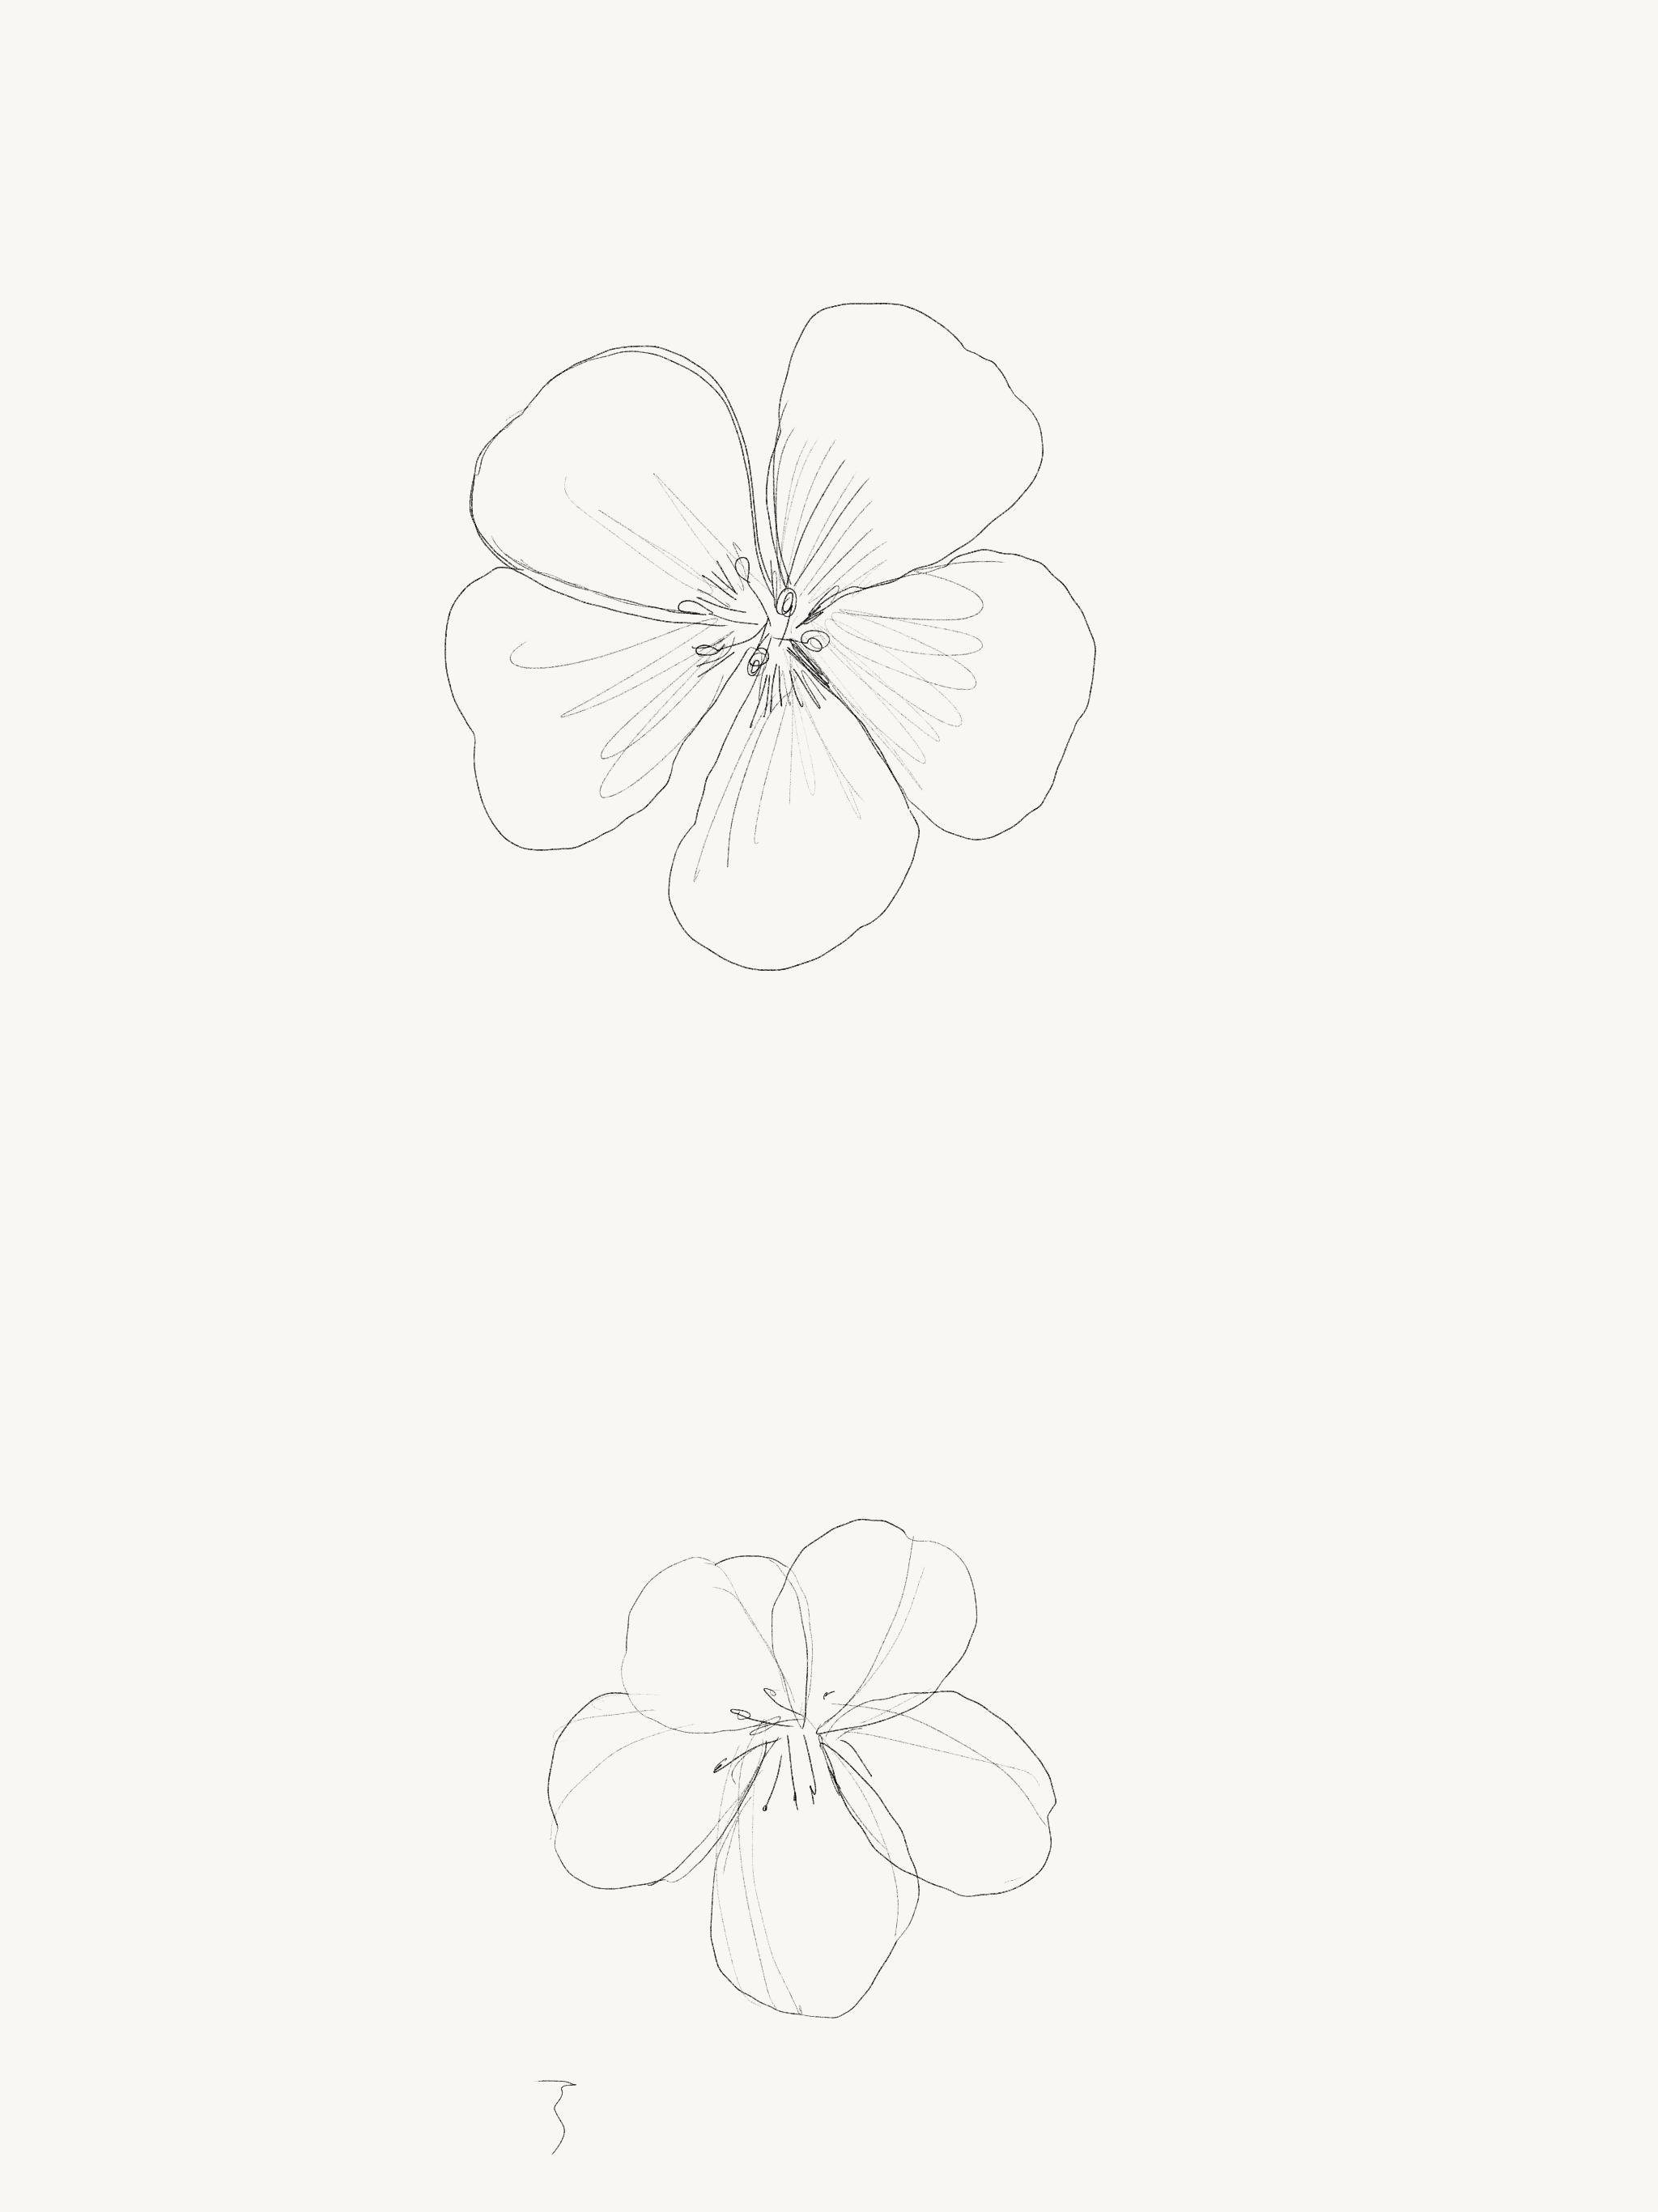 Adobe Photoshop Sketch로 제작 다운로드: http://apple.co/1cze7qs